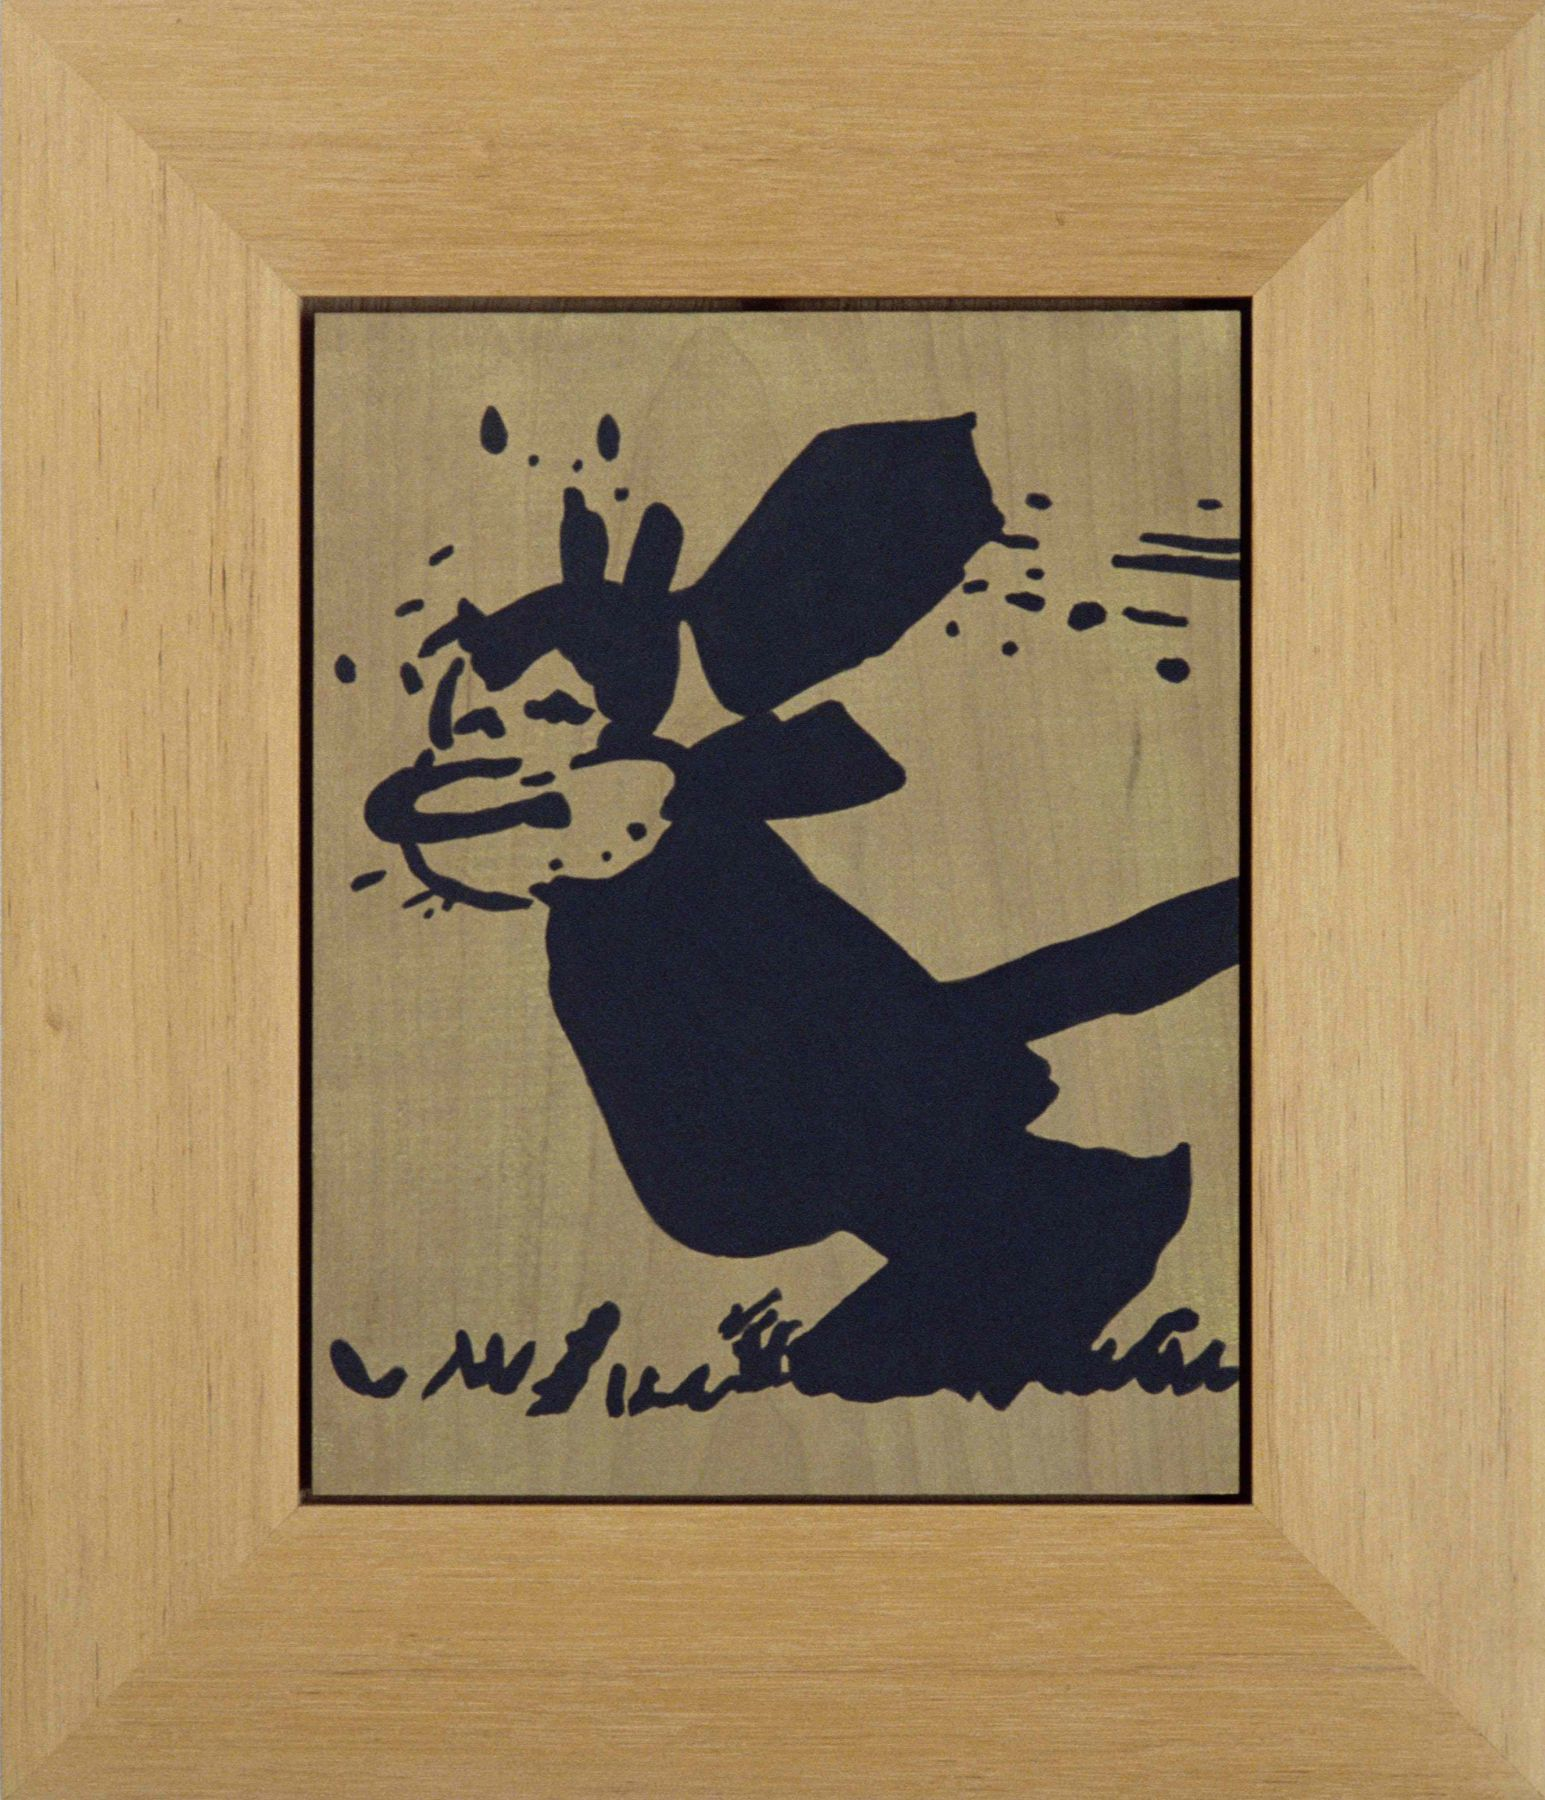 Sherrie Levine Untitled (Krazy Kat: 10), 1992 Casein on cherrywood 18 x 15.5 inches 45.7 x 39.4 cm